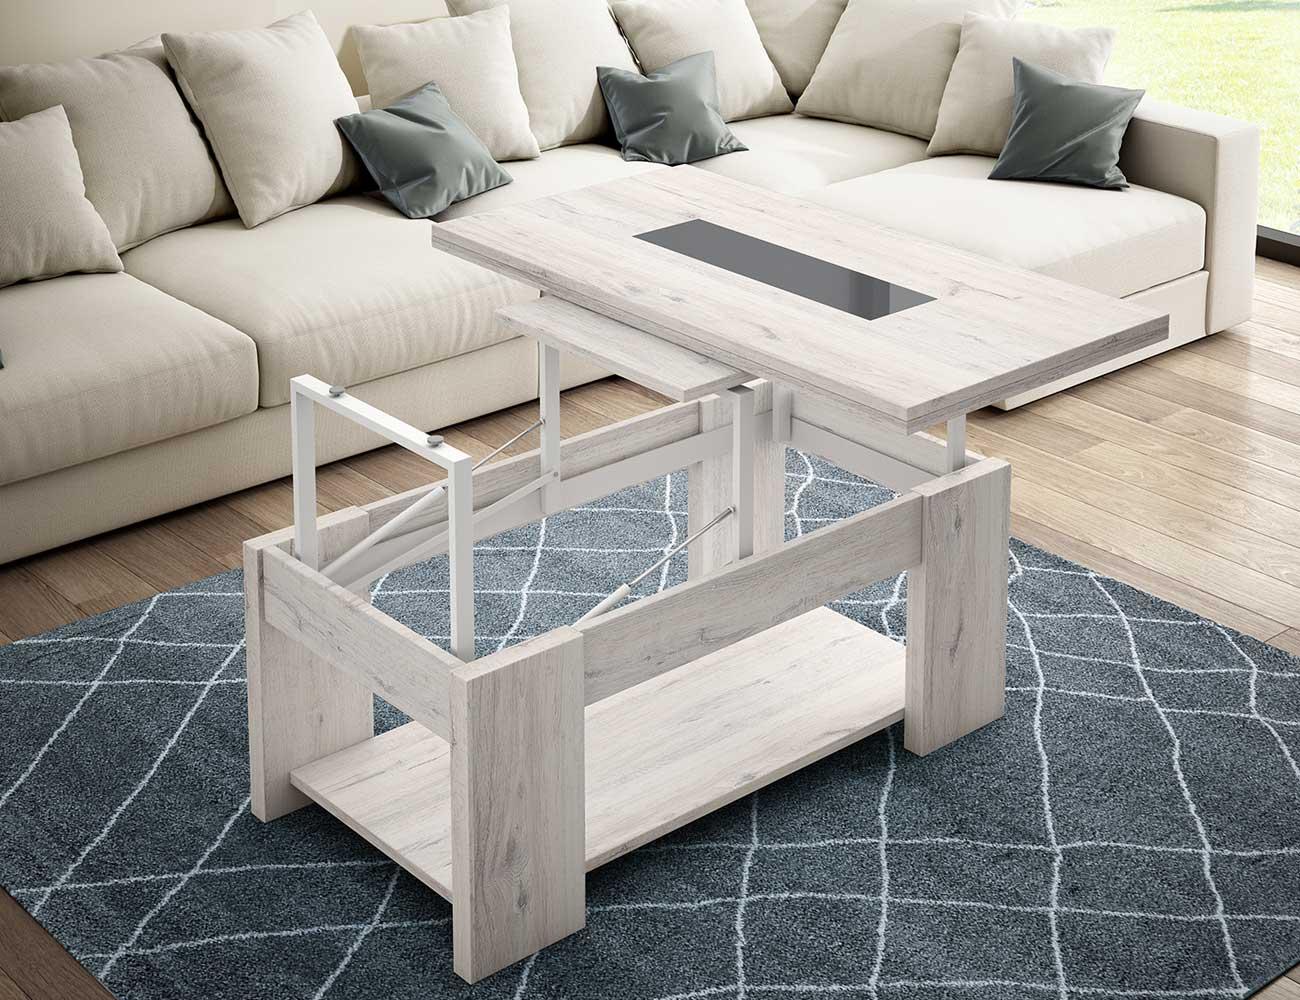 Mesa de centro convertible en mesa de comedor (24631) | Factory del ...